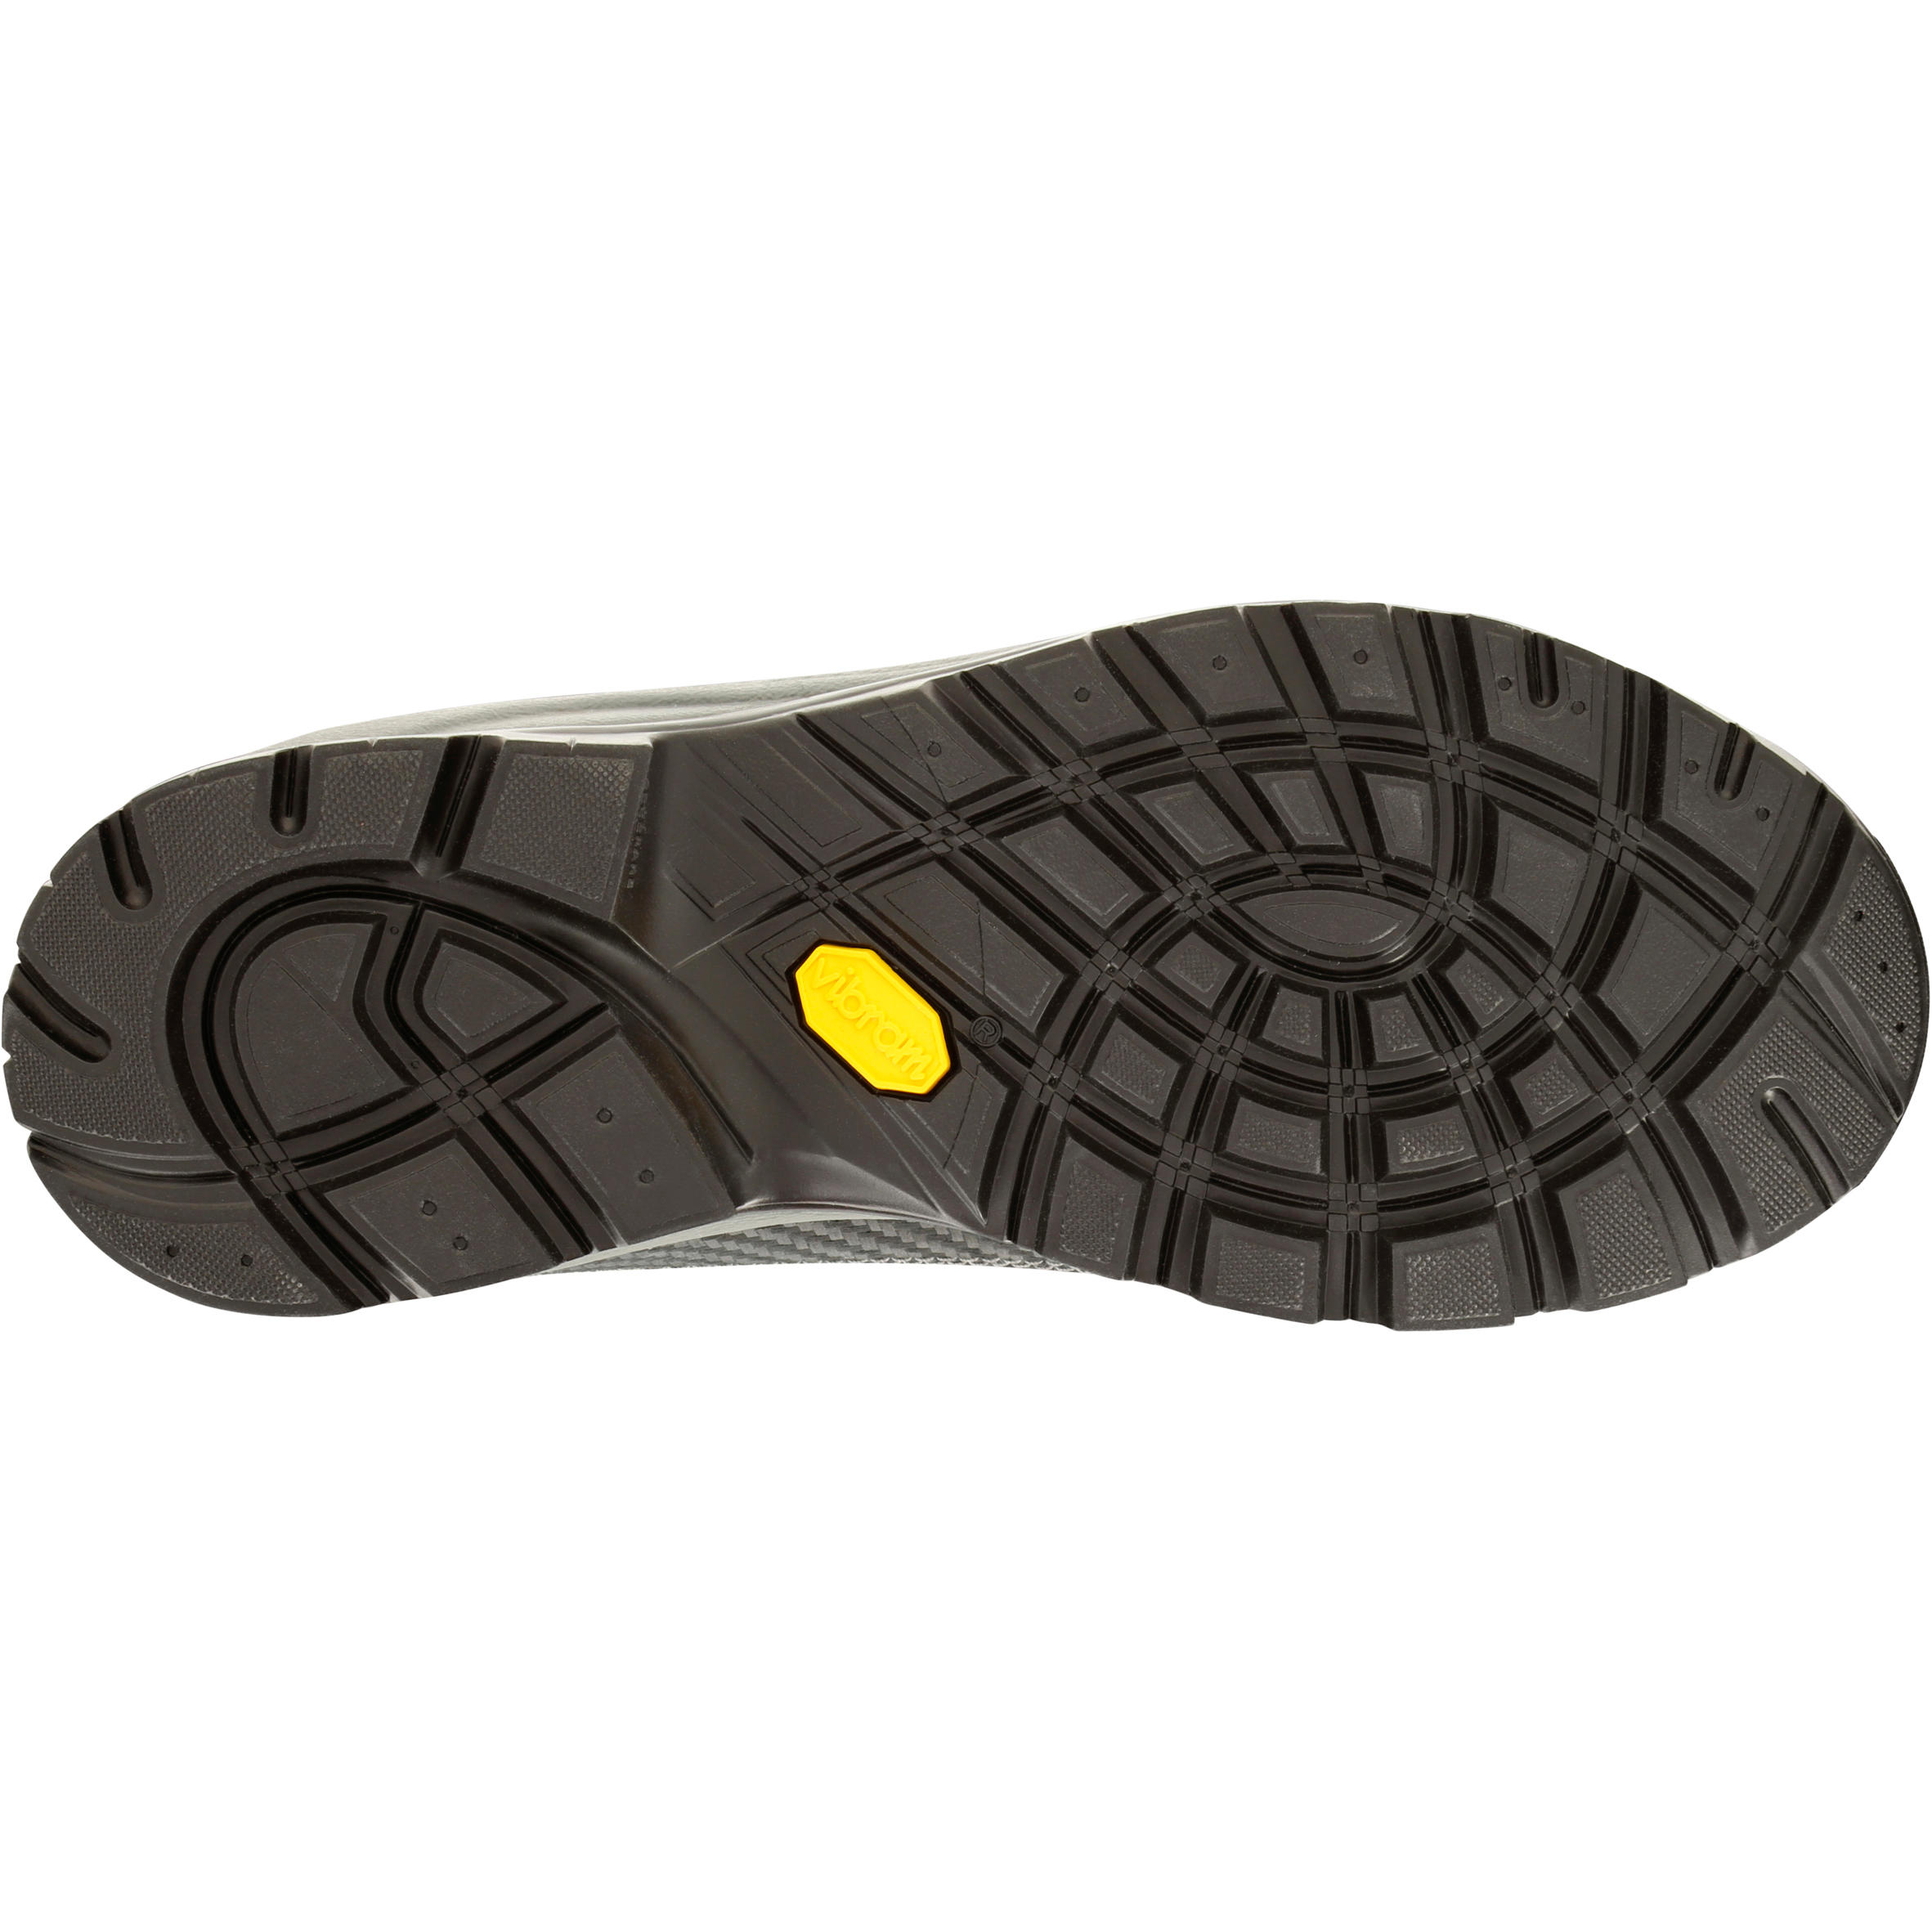 Vtt Mm HommeH Asolo De Chaussure Track OywvNmn80